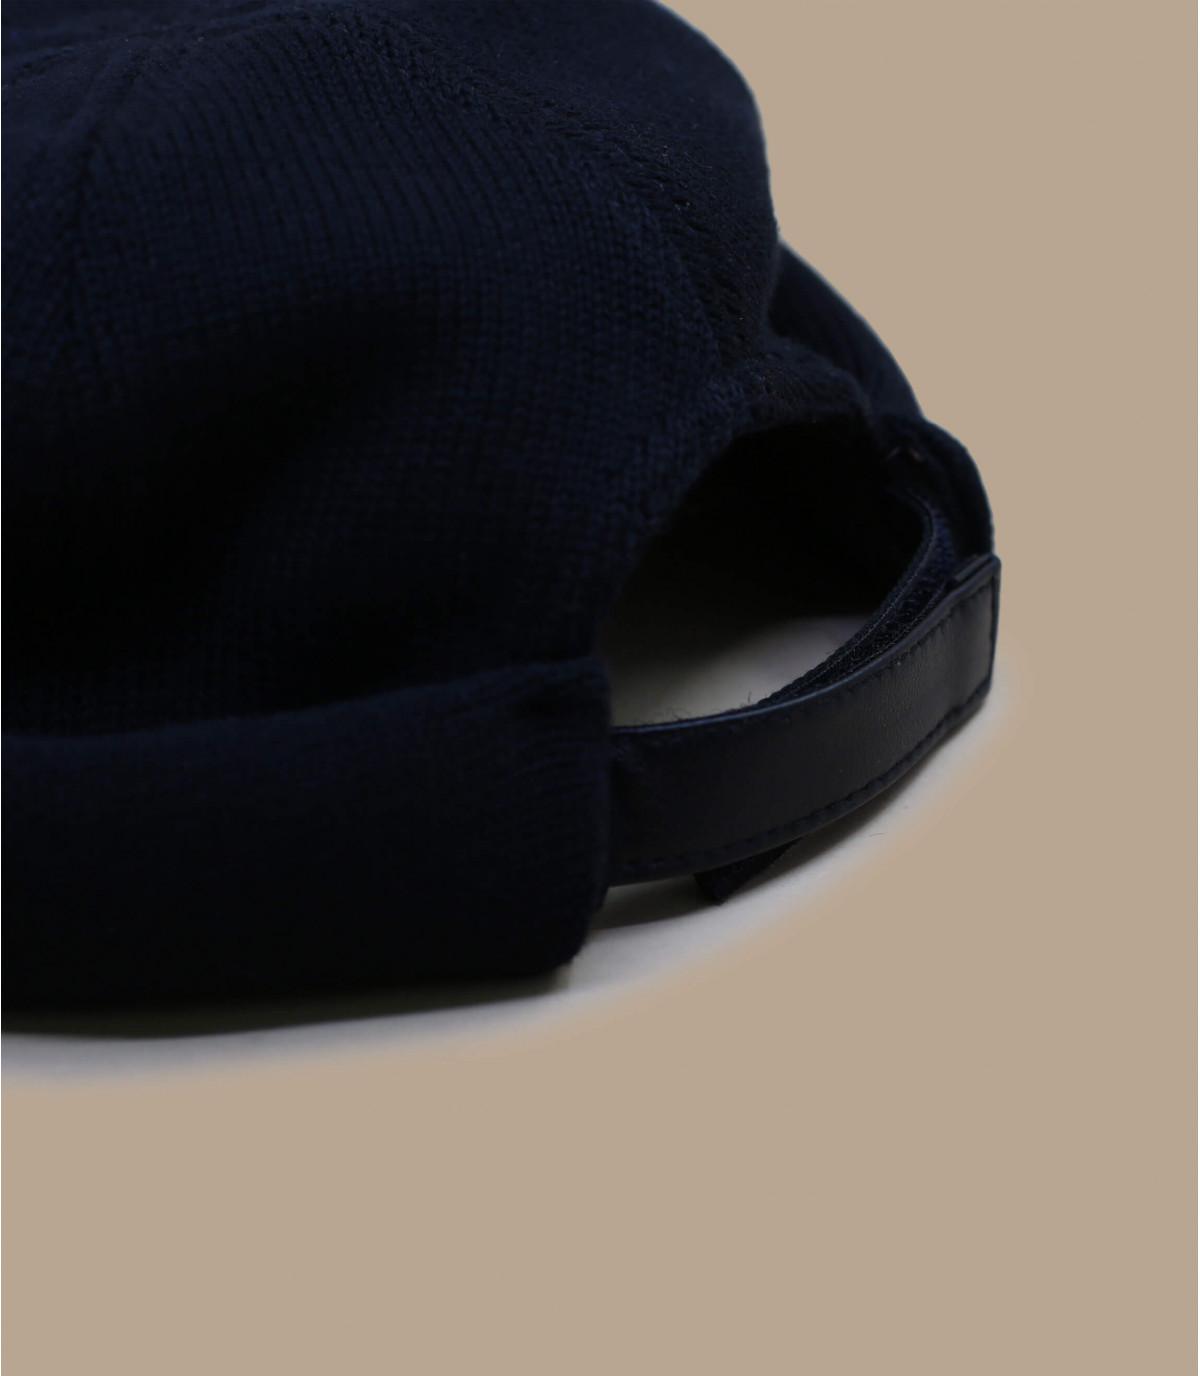 Details Docker Cotton Knit black - Abbildung 2